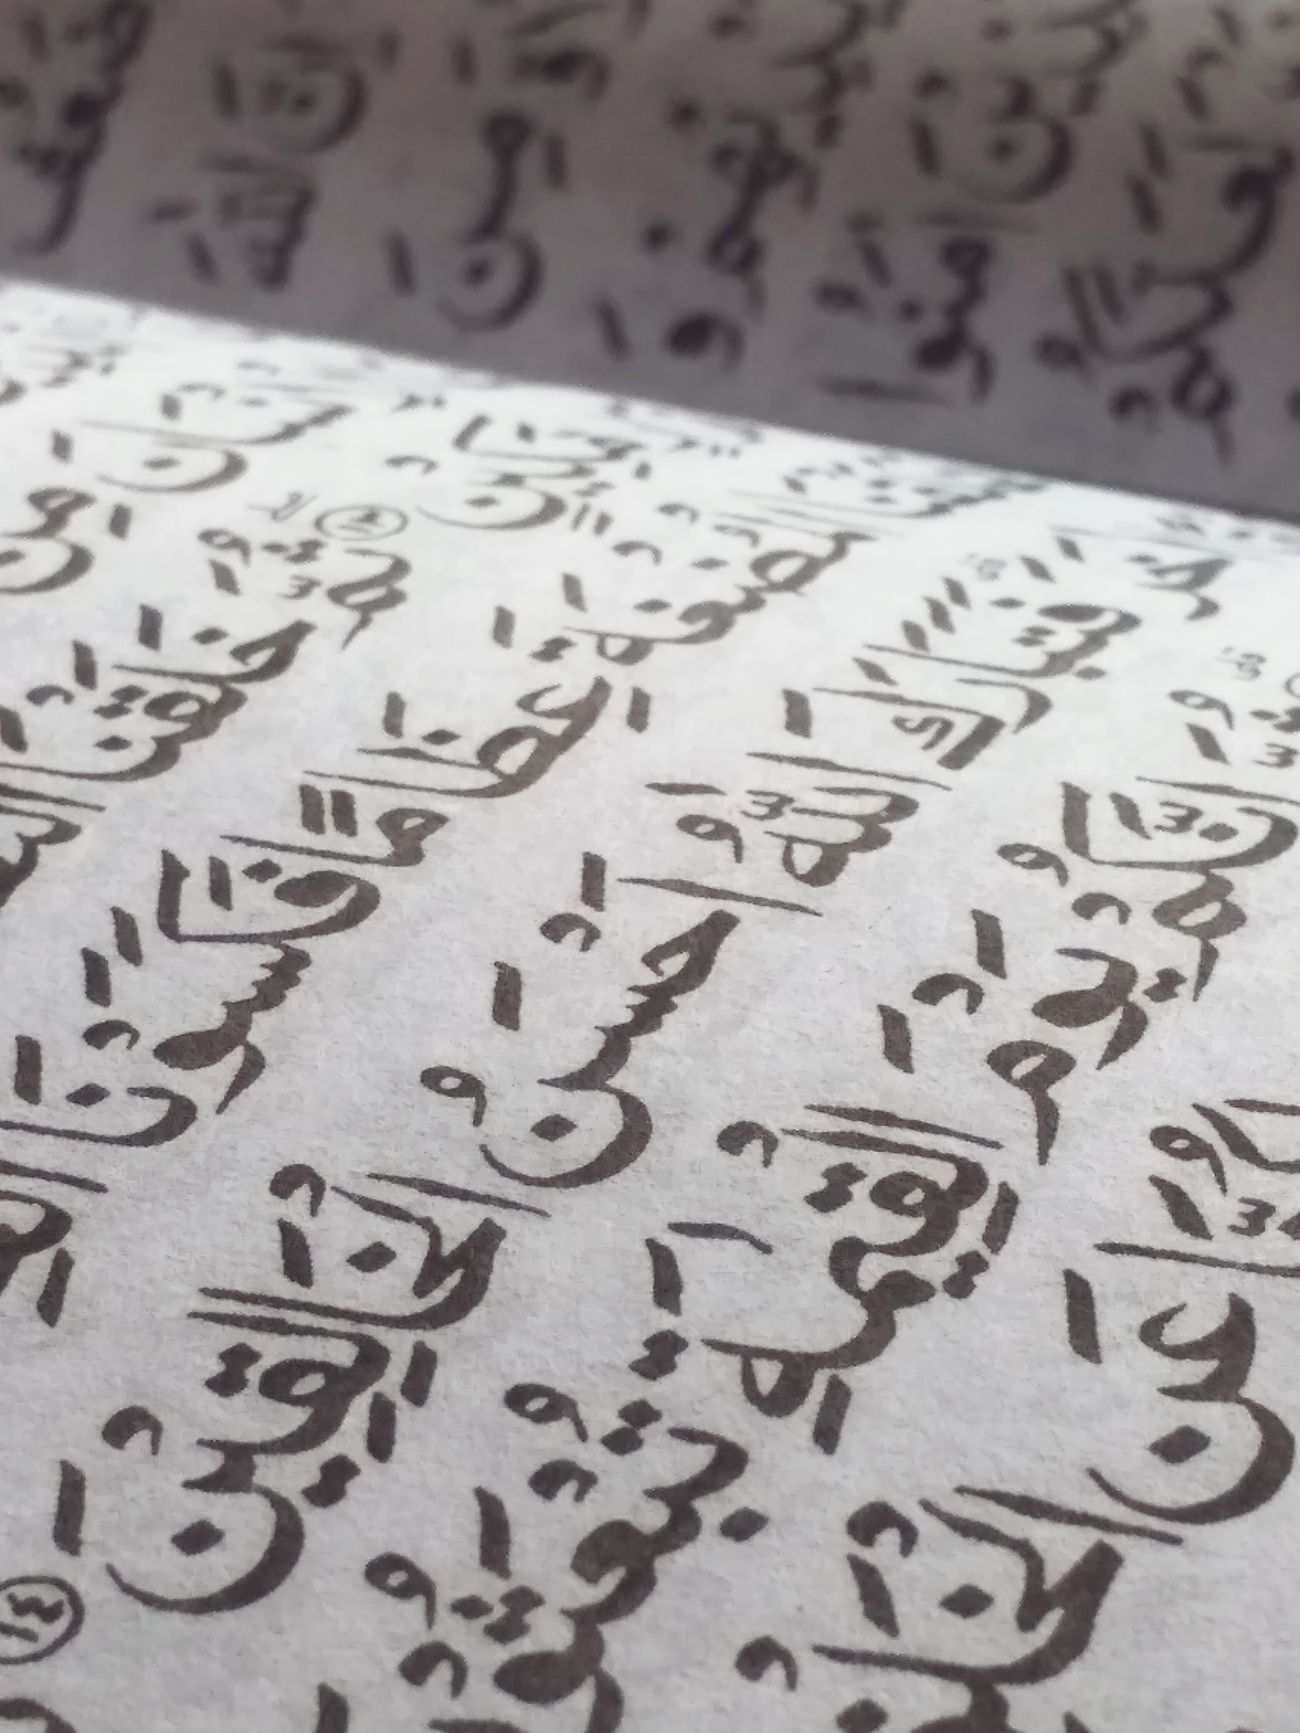 Text Paper Close-up AlQuran Beautiful EyeEmNewHere First Eyeem Photo Eyeemphoto